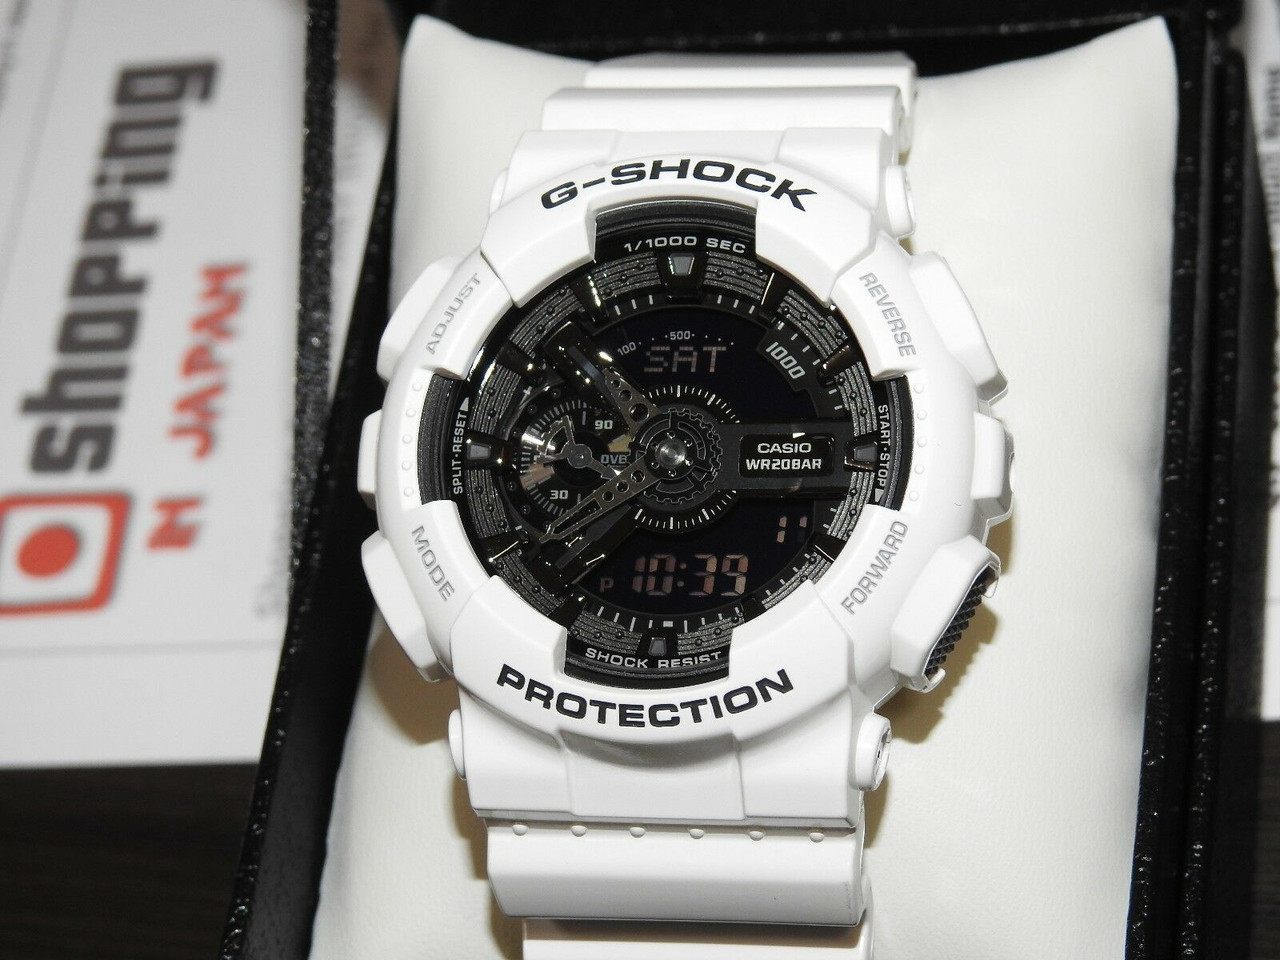 G-Shock GA-110GW-7AJF